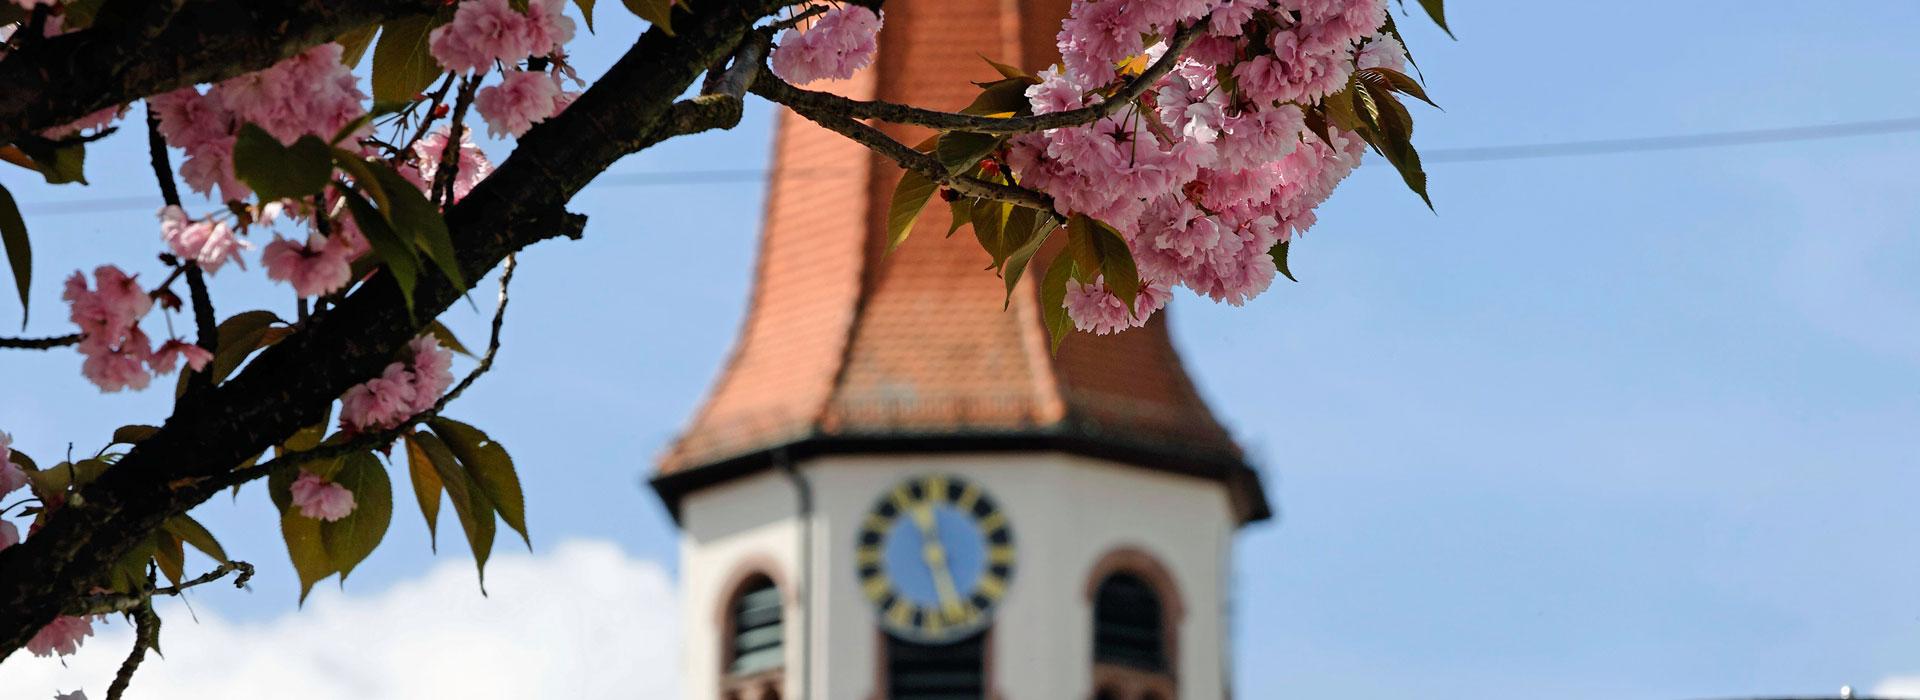 Kirchturm Oberkochen